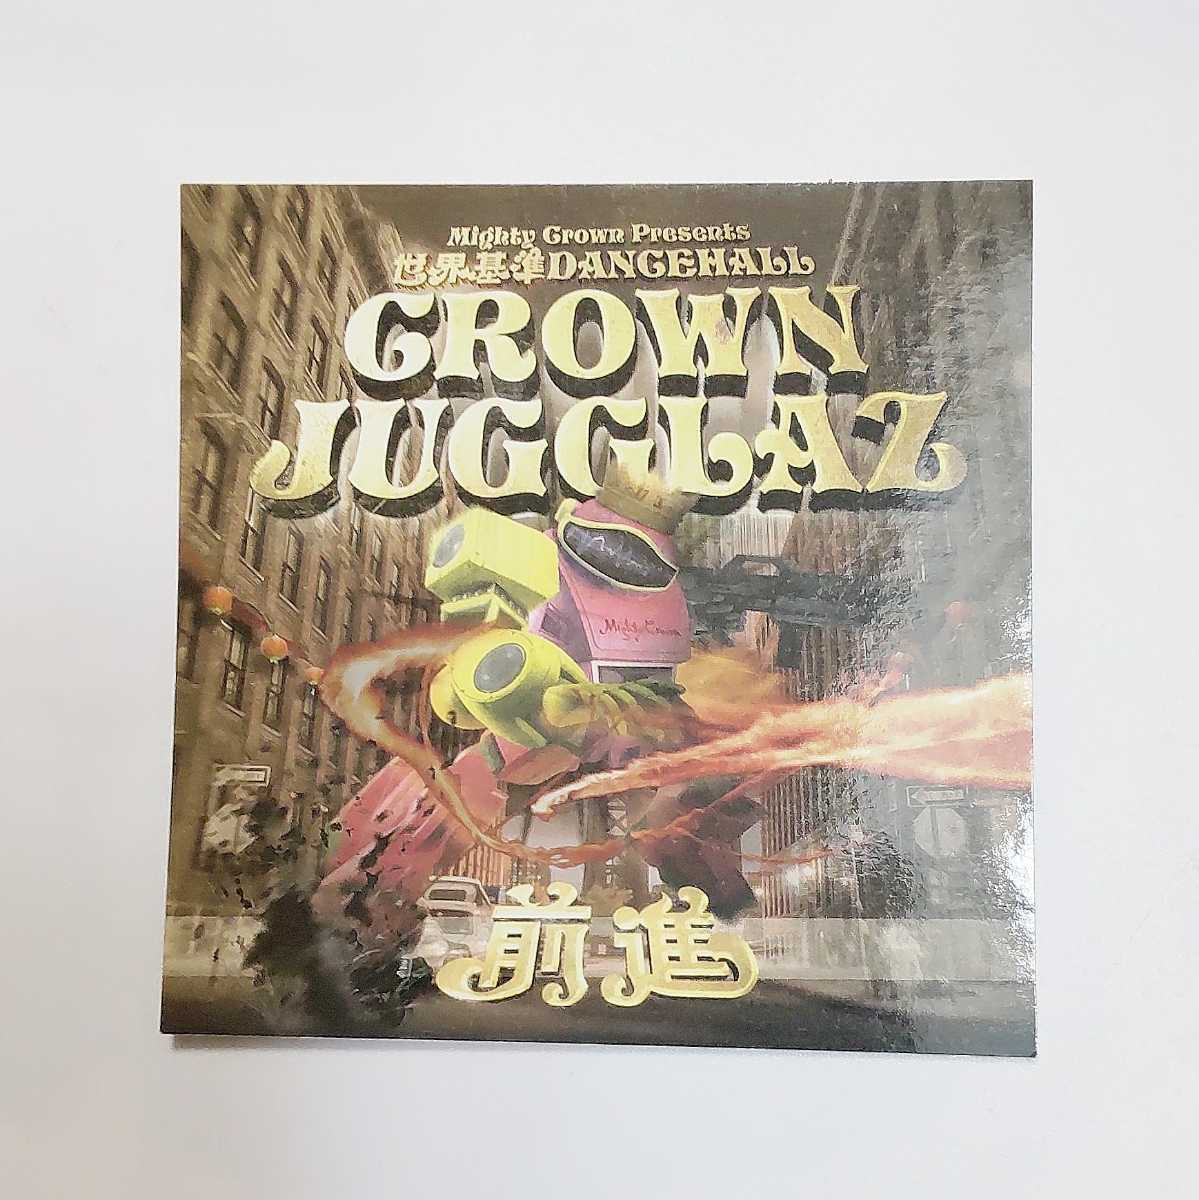 Mighty Crown JUGGLAZ 世界基準 DANCEHALL 前進 ステッカー★検)ノベルティー シール 非売品 販促品 デッドストック 当時物 ダンスホール_画像1